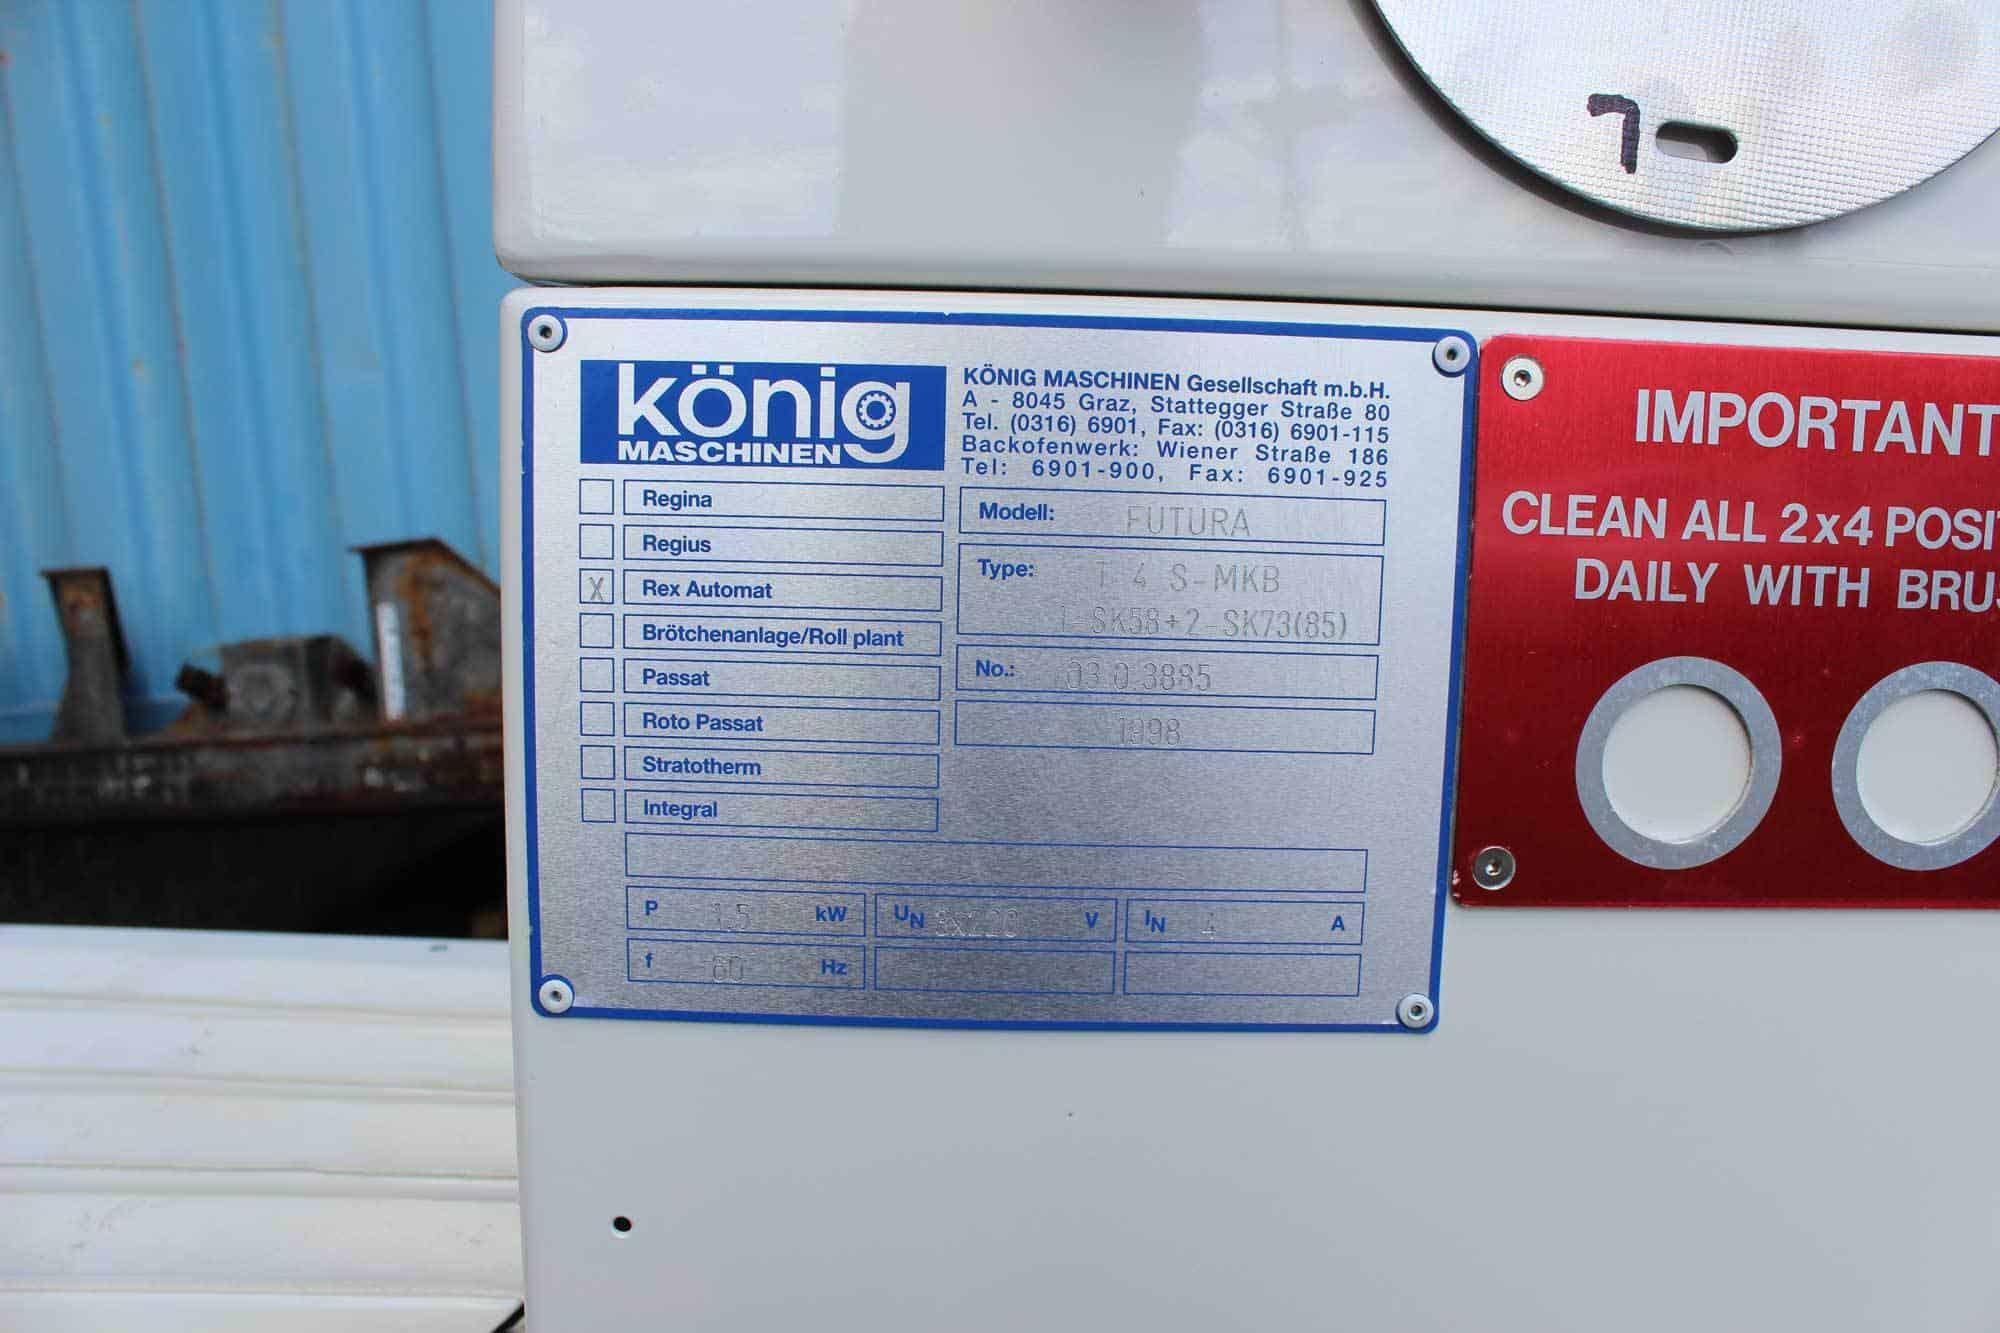 Konig-Futura-Serial-Plate